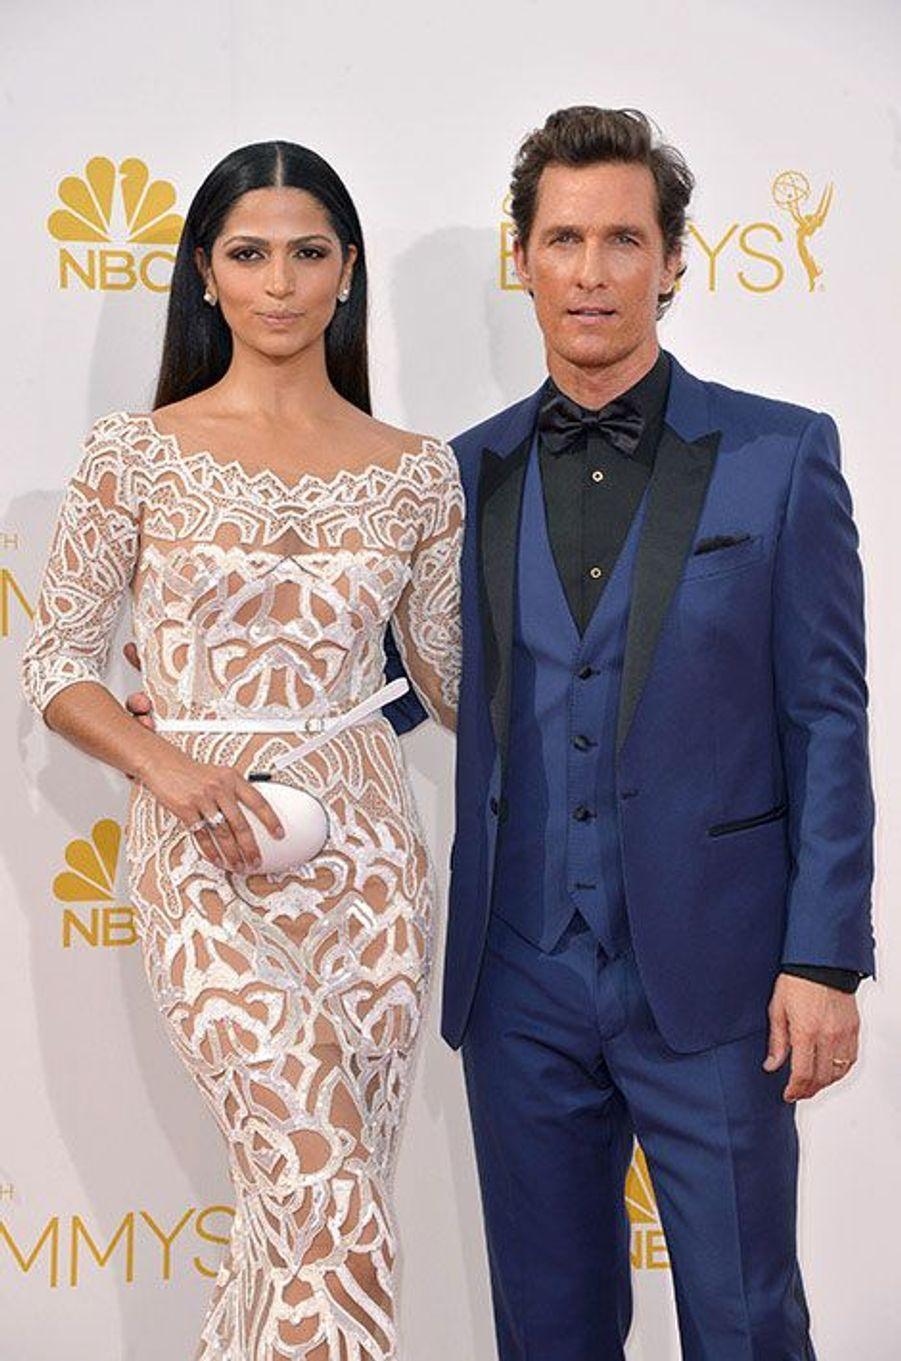 Camila Alves et Matthew McConaughey aux Emmy Awards 2014